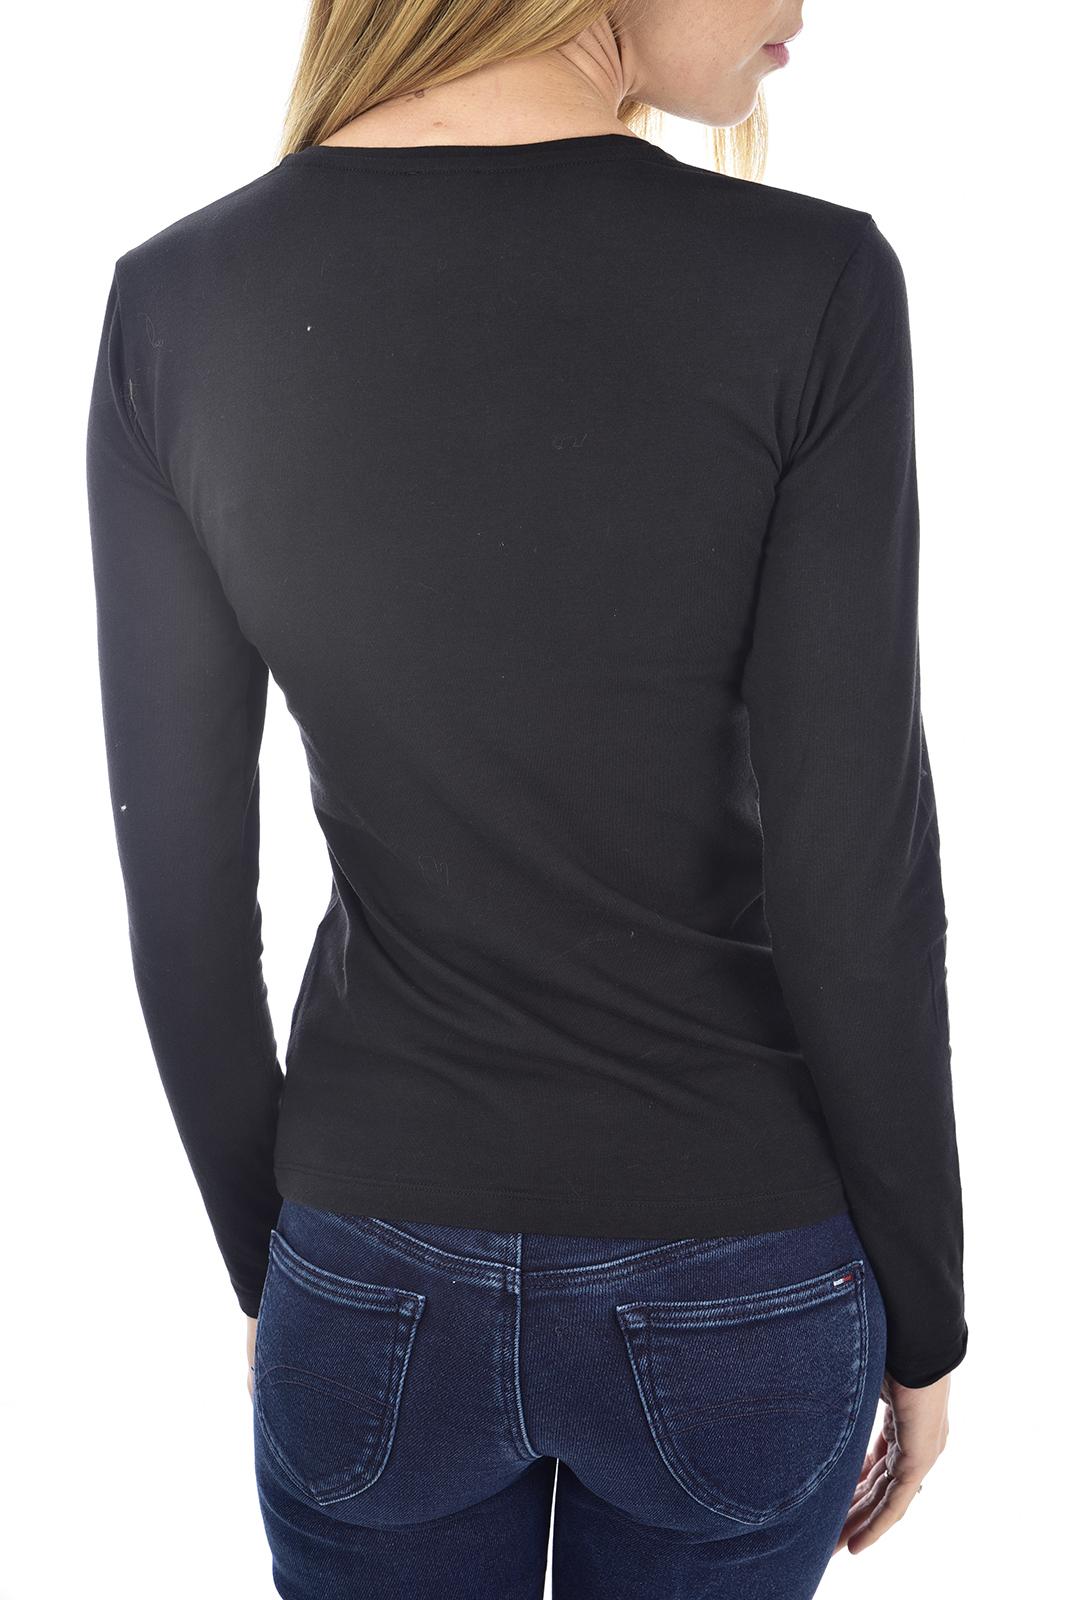 Tee shirt manches longues  Emporio armani 163229 9A232 020 BLACK